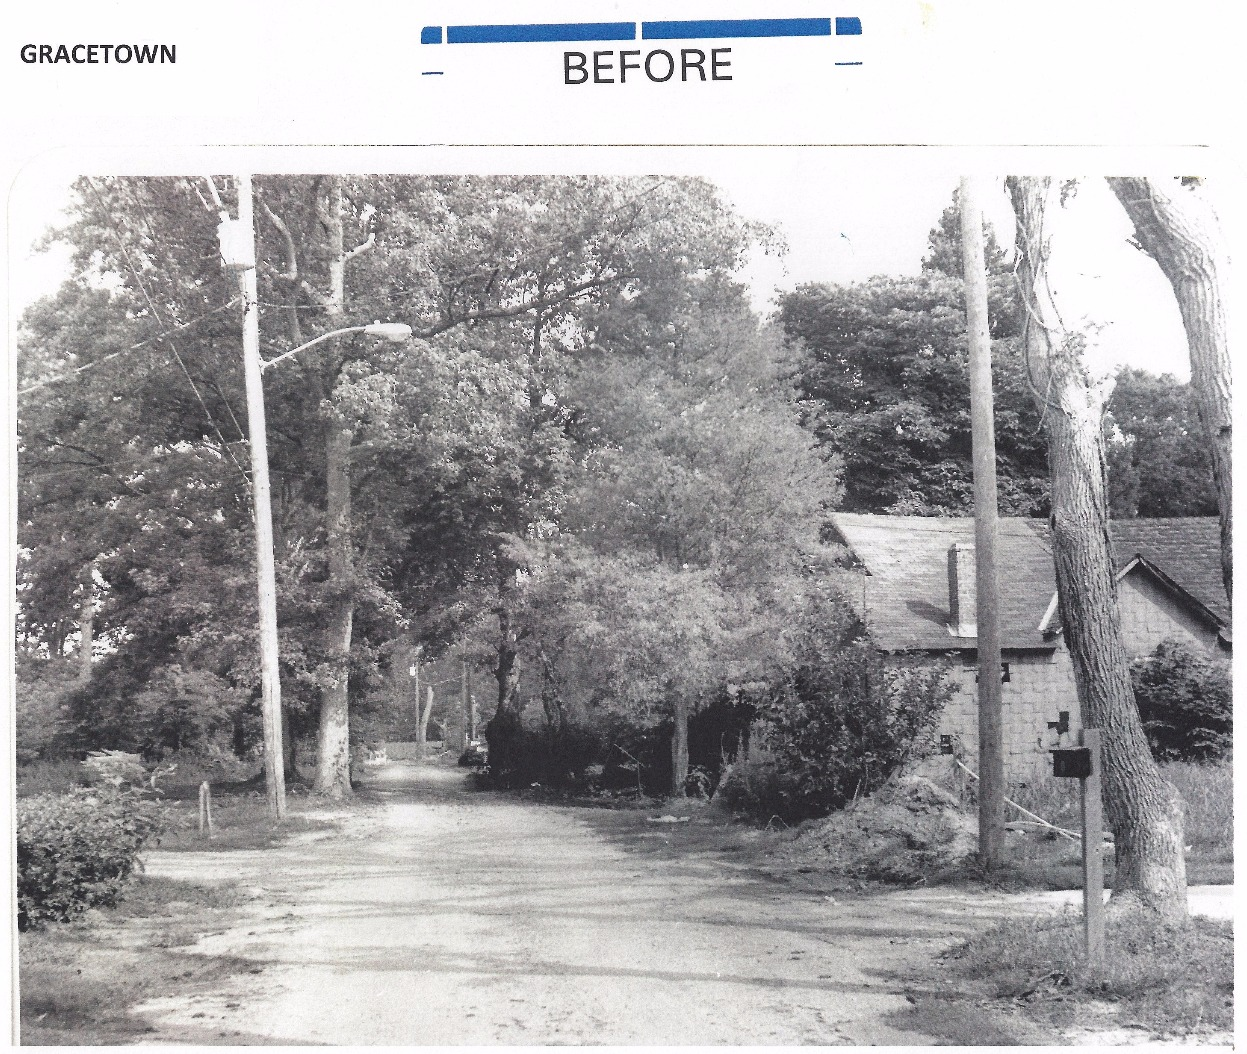 Gracetown - before